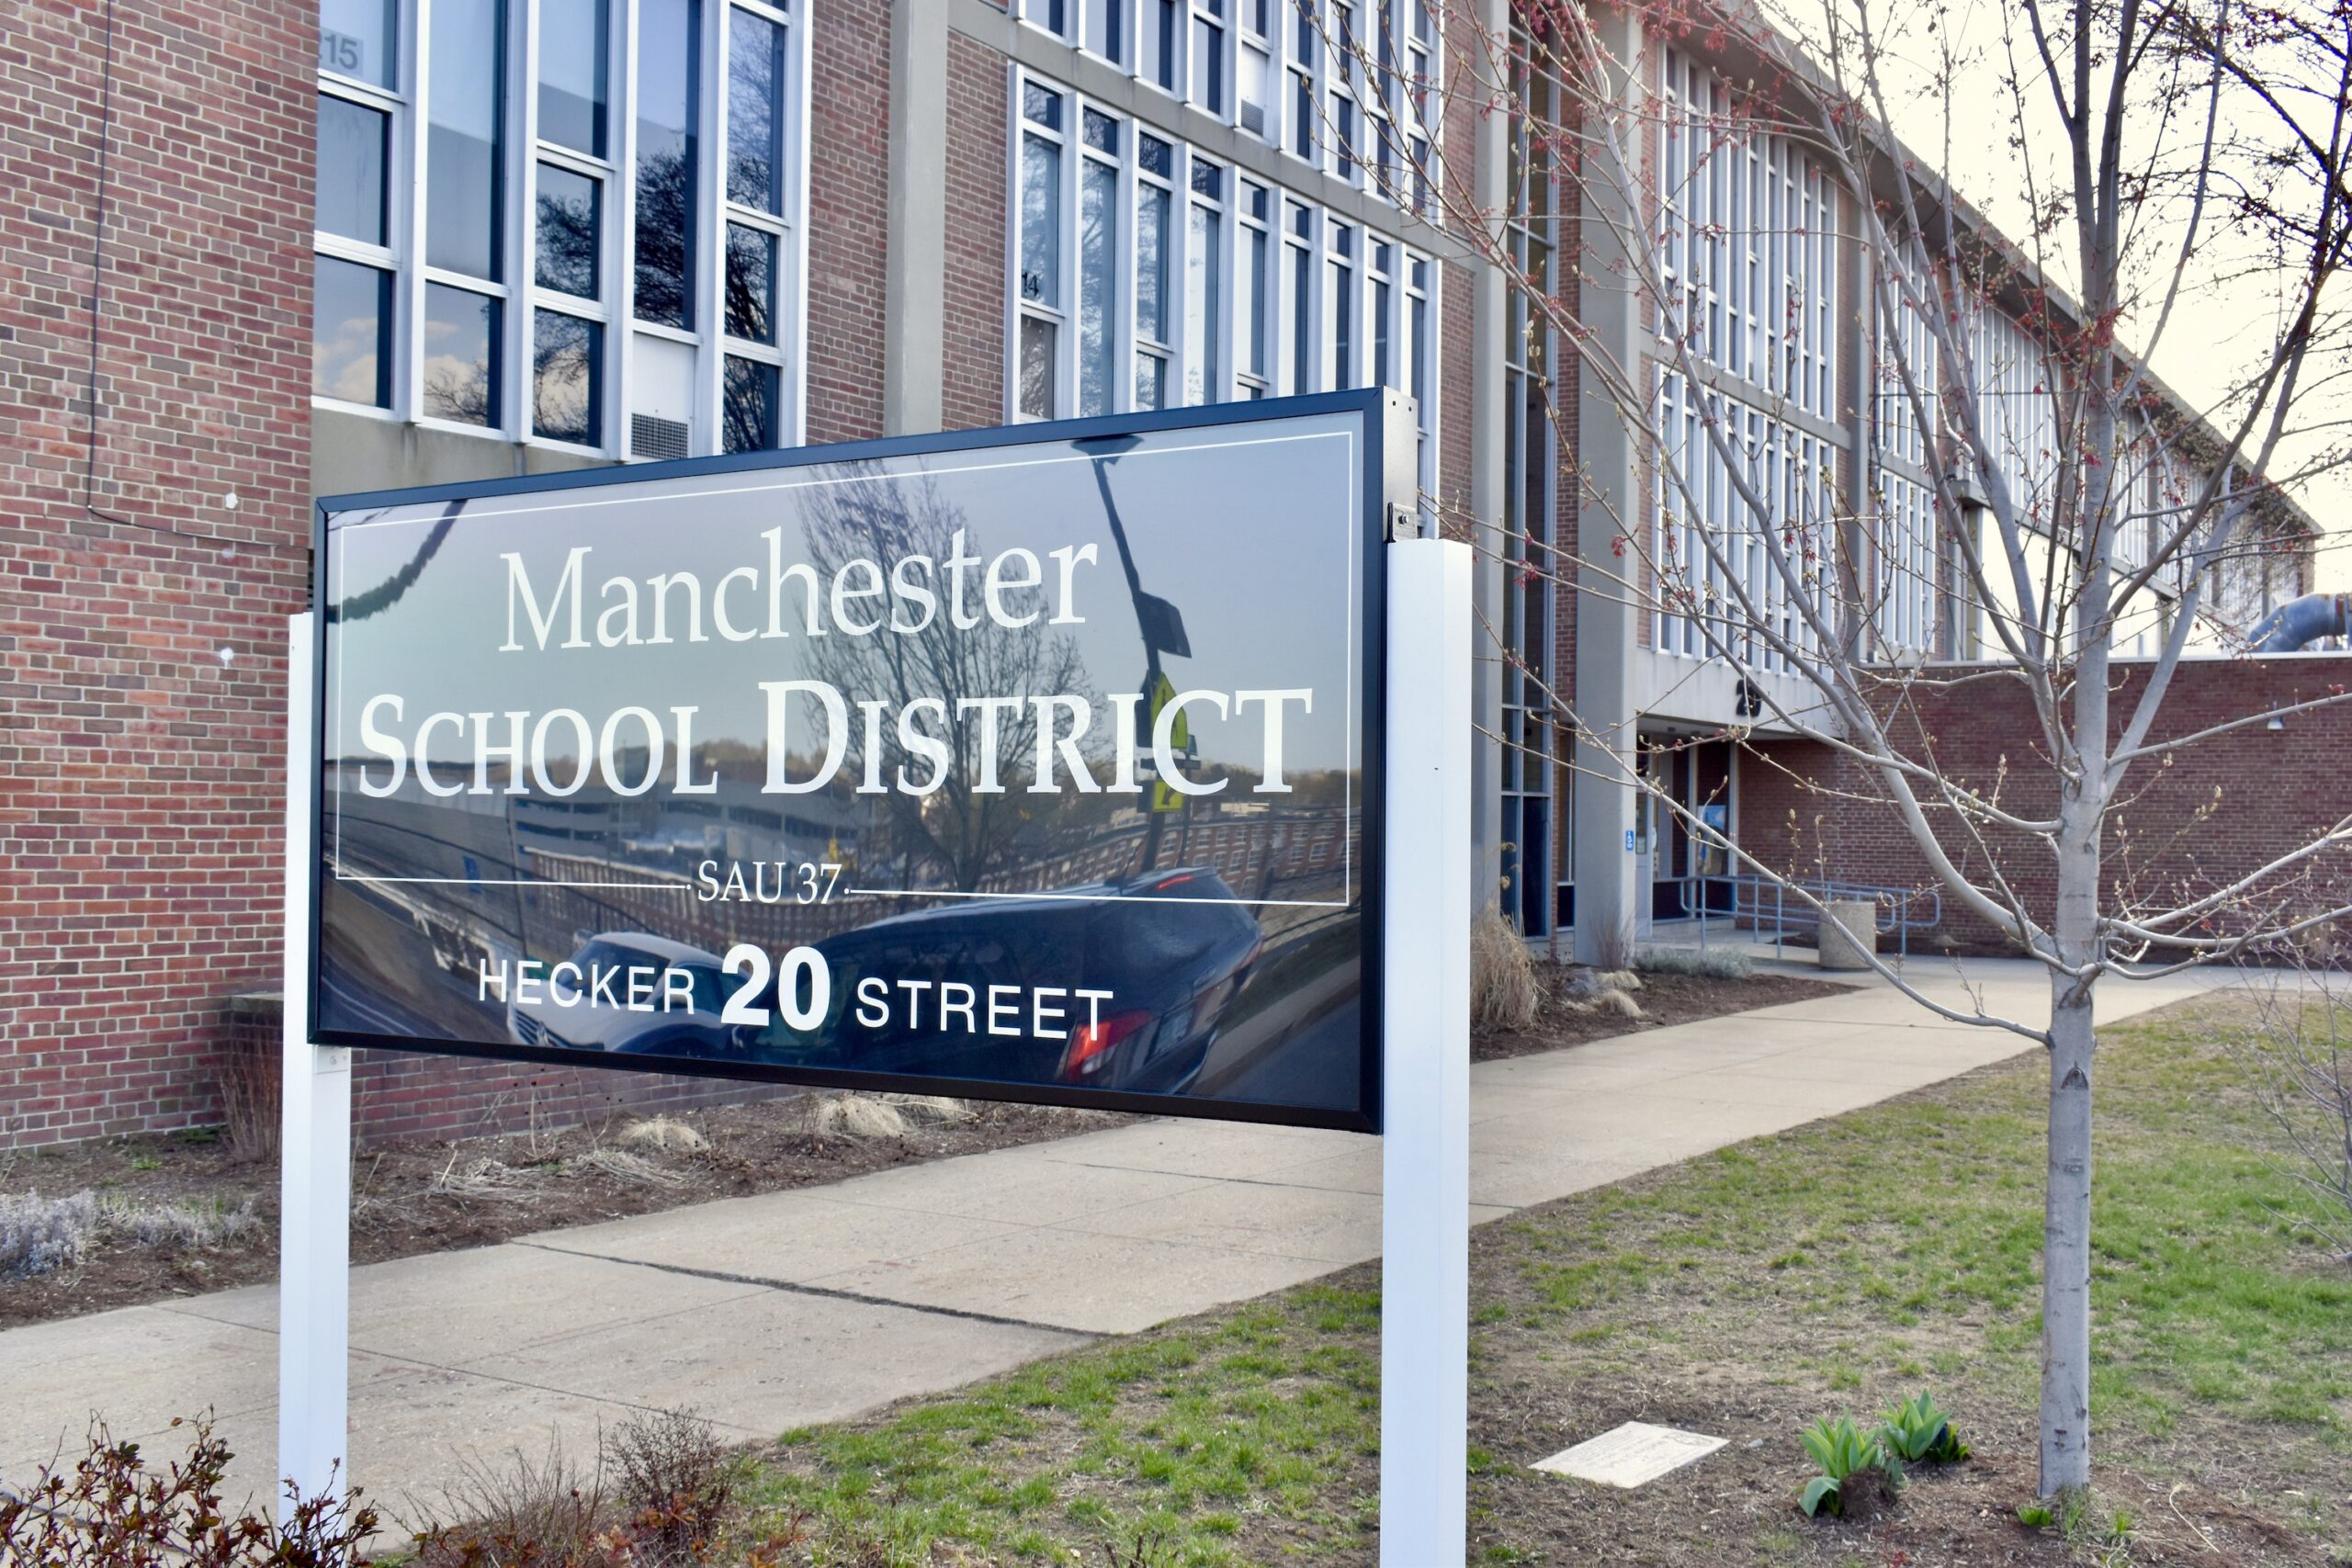 Manchester School District headquarters